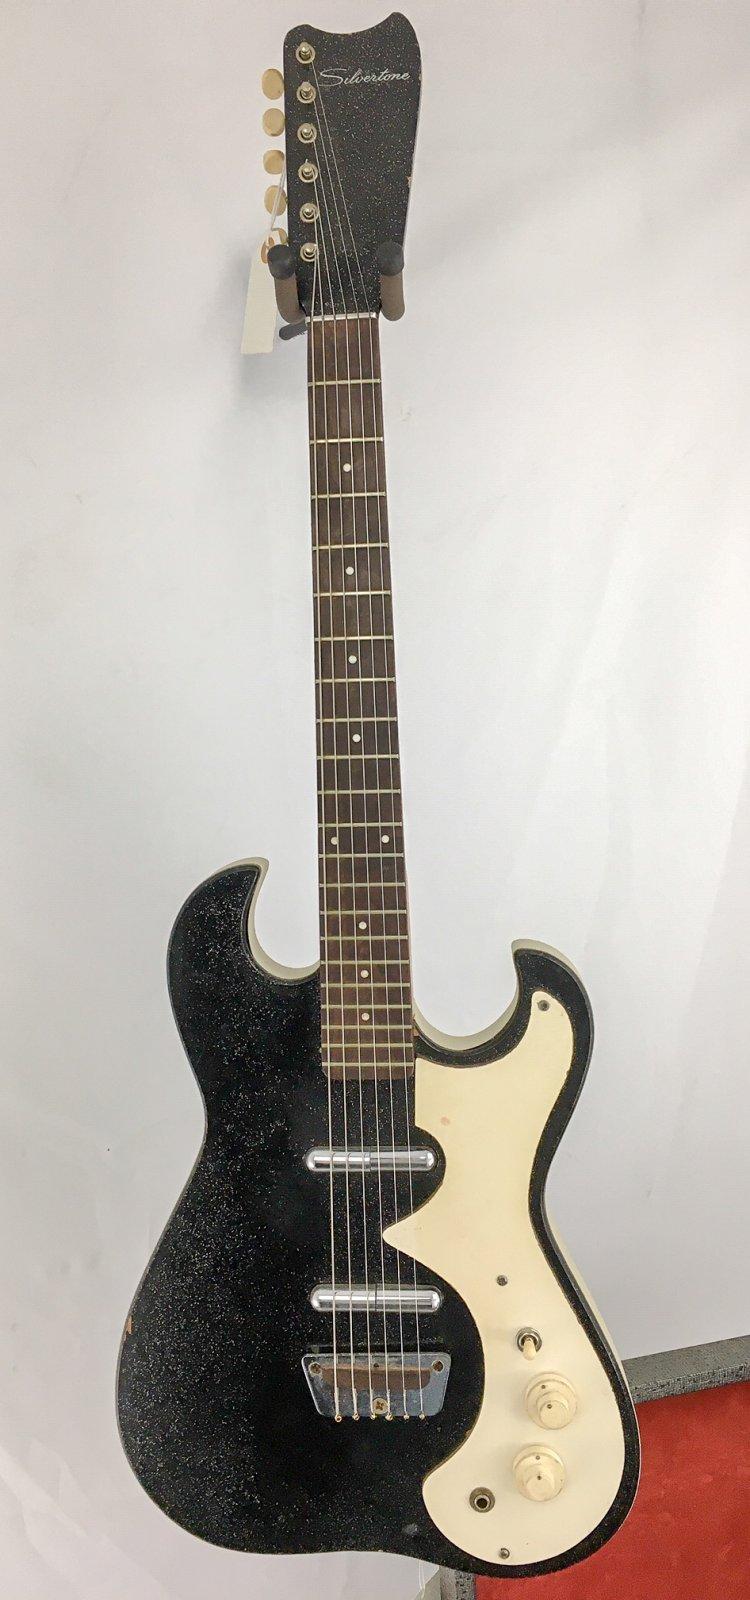 Silvertone 1449 w/Amp Case